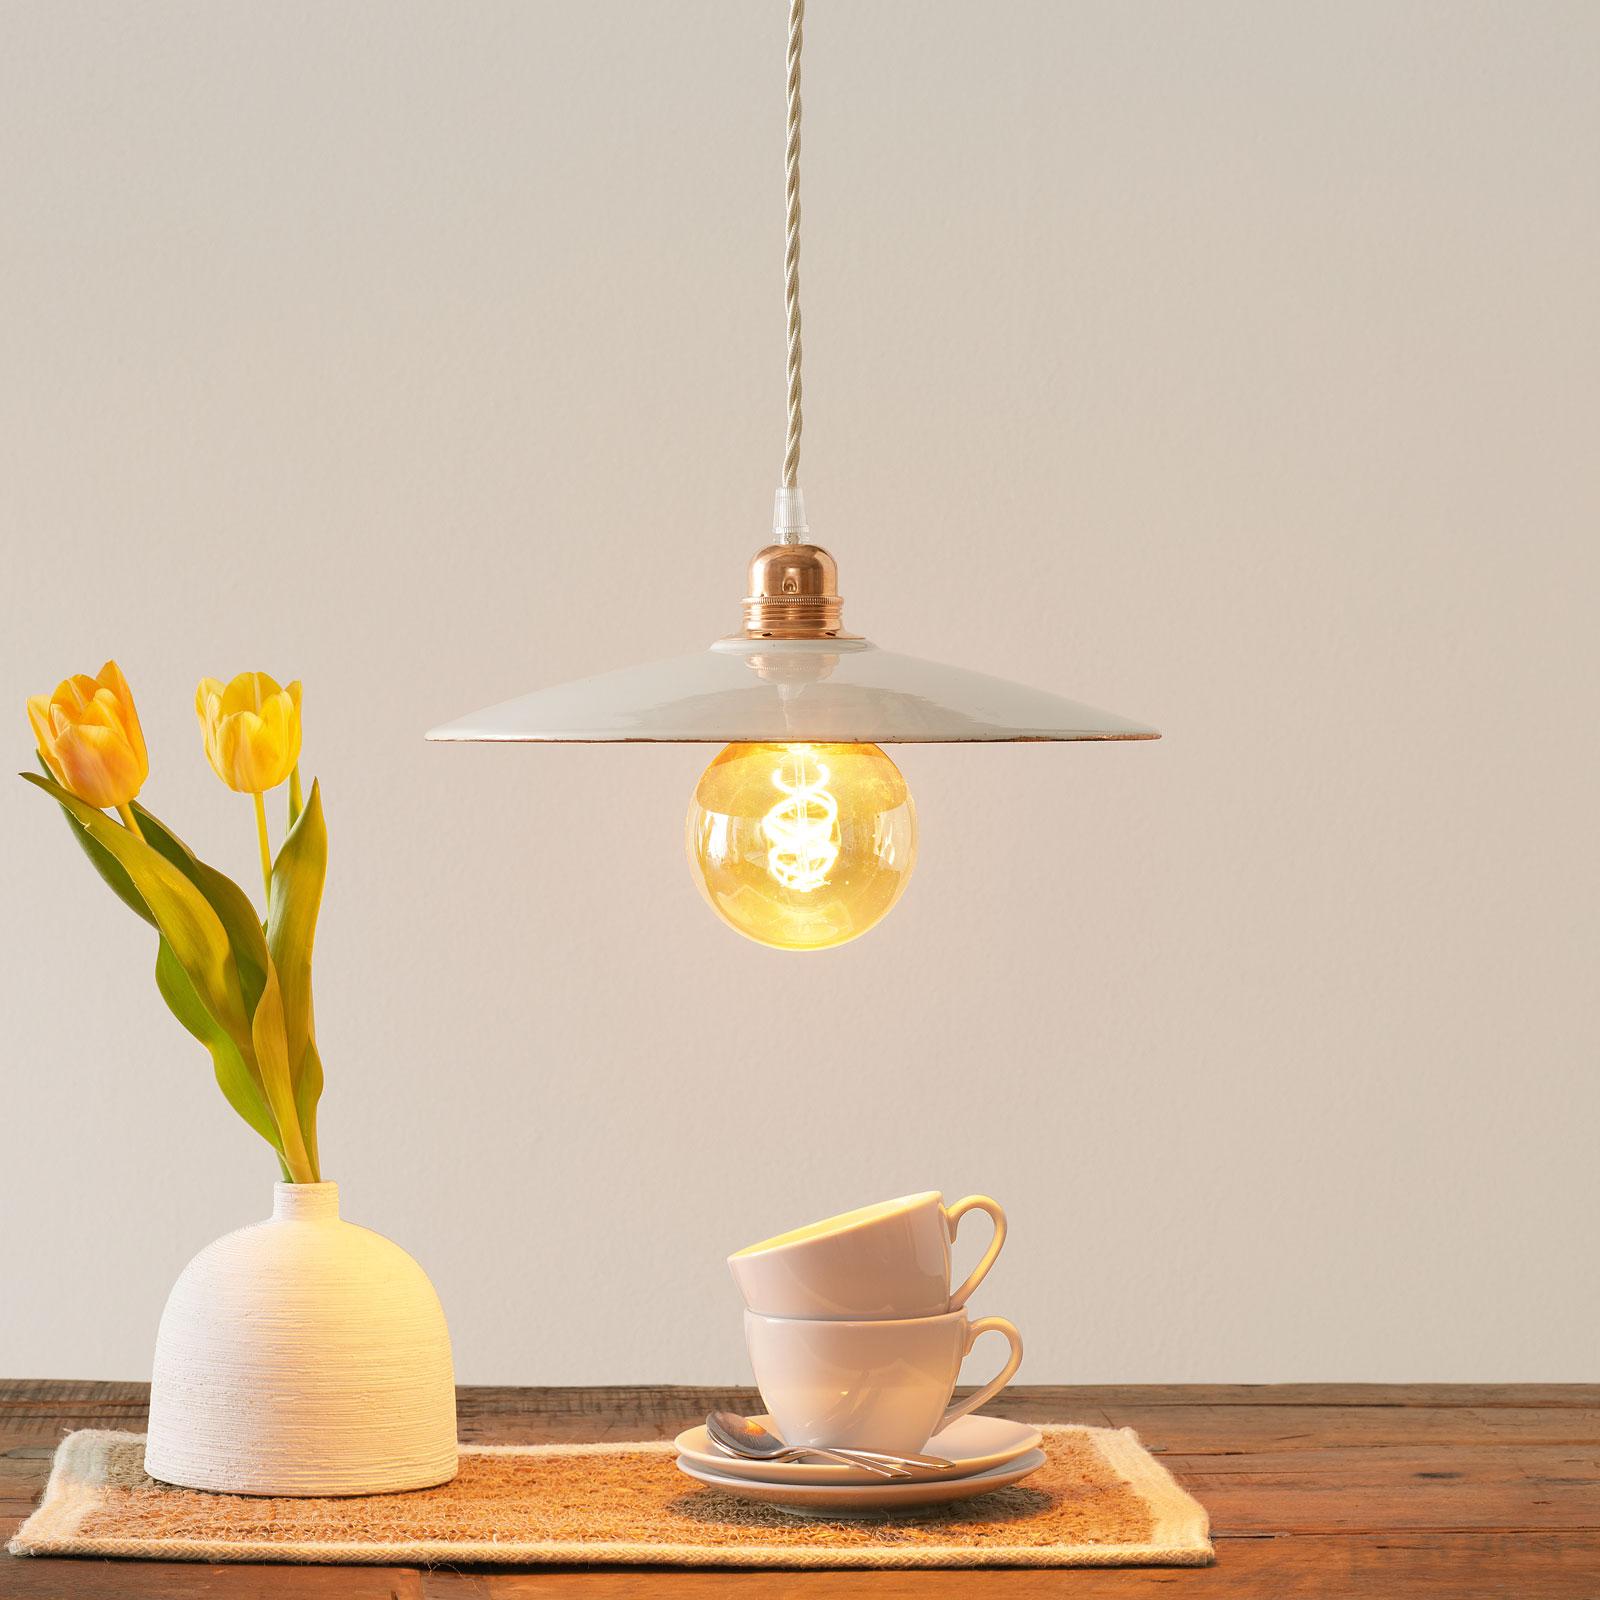 Keramiek-hanglamp S1836, wit/koper